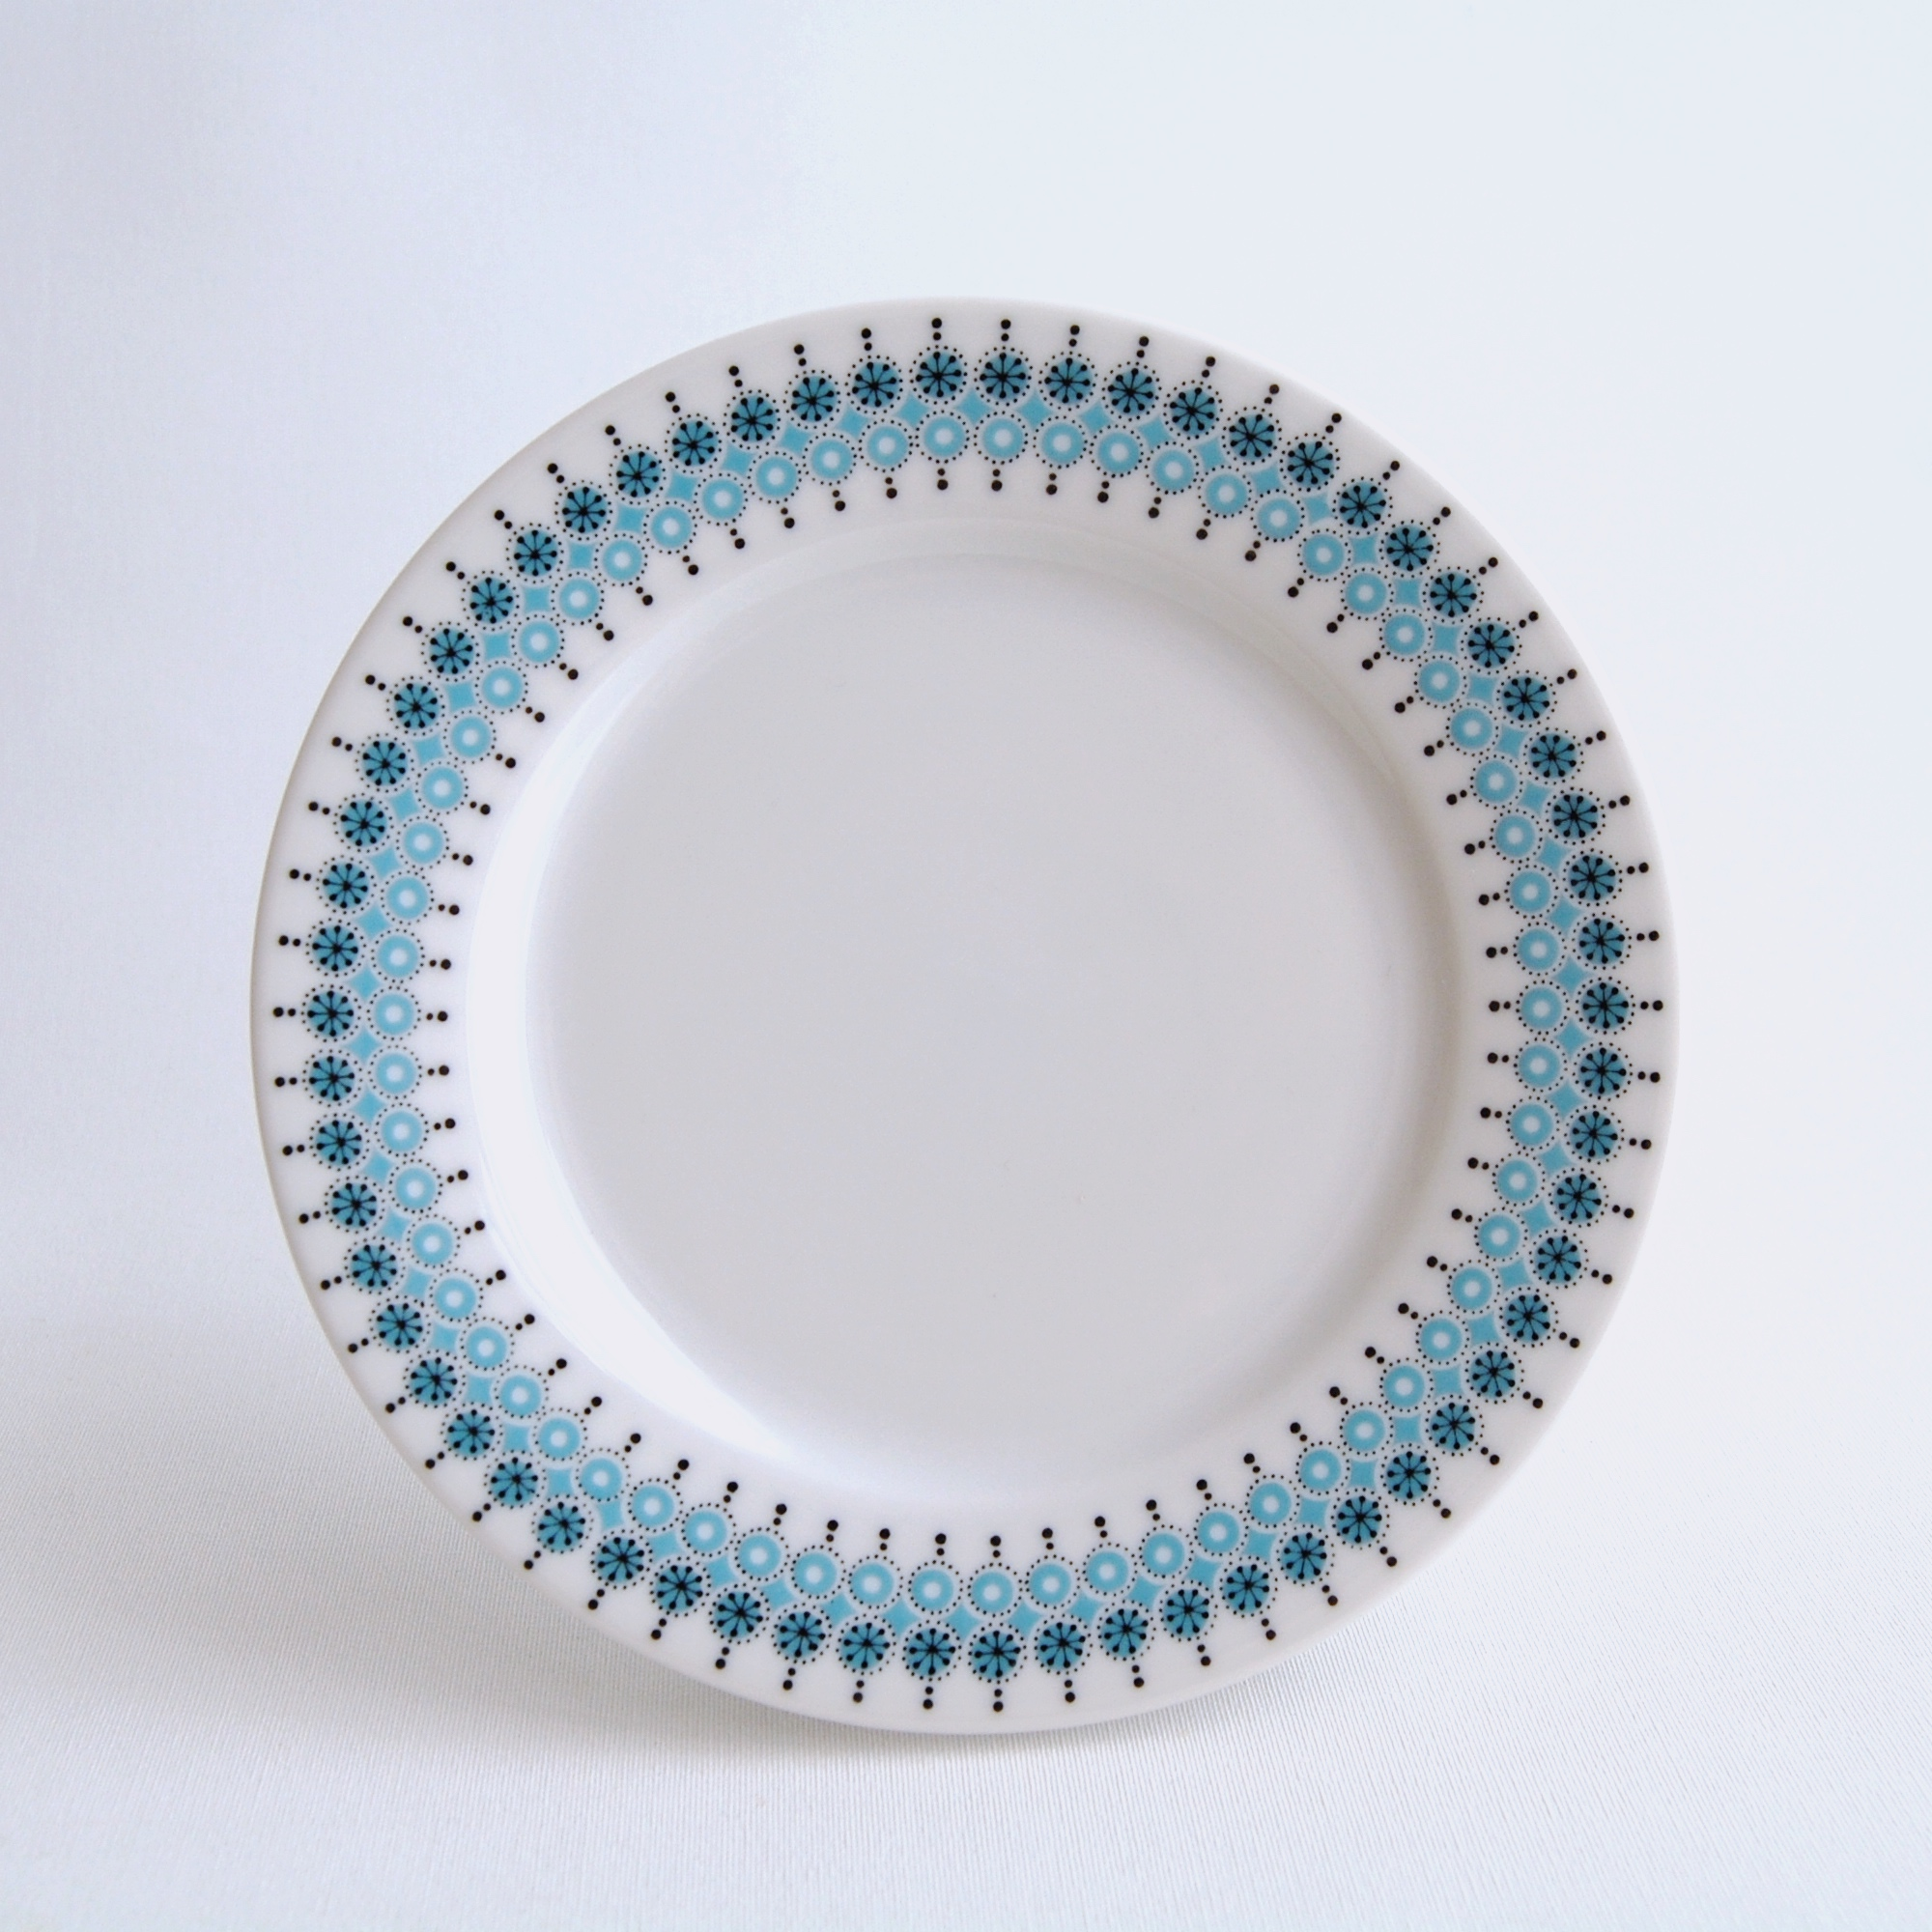 ARABIA/アラビア Louhi/ロウヒ 17cmプレート 01